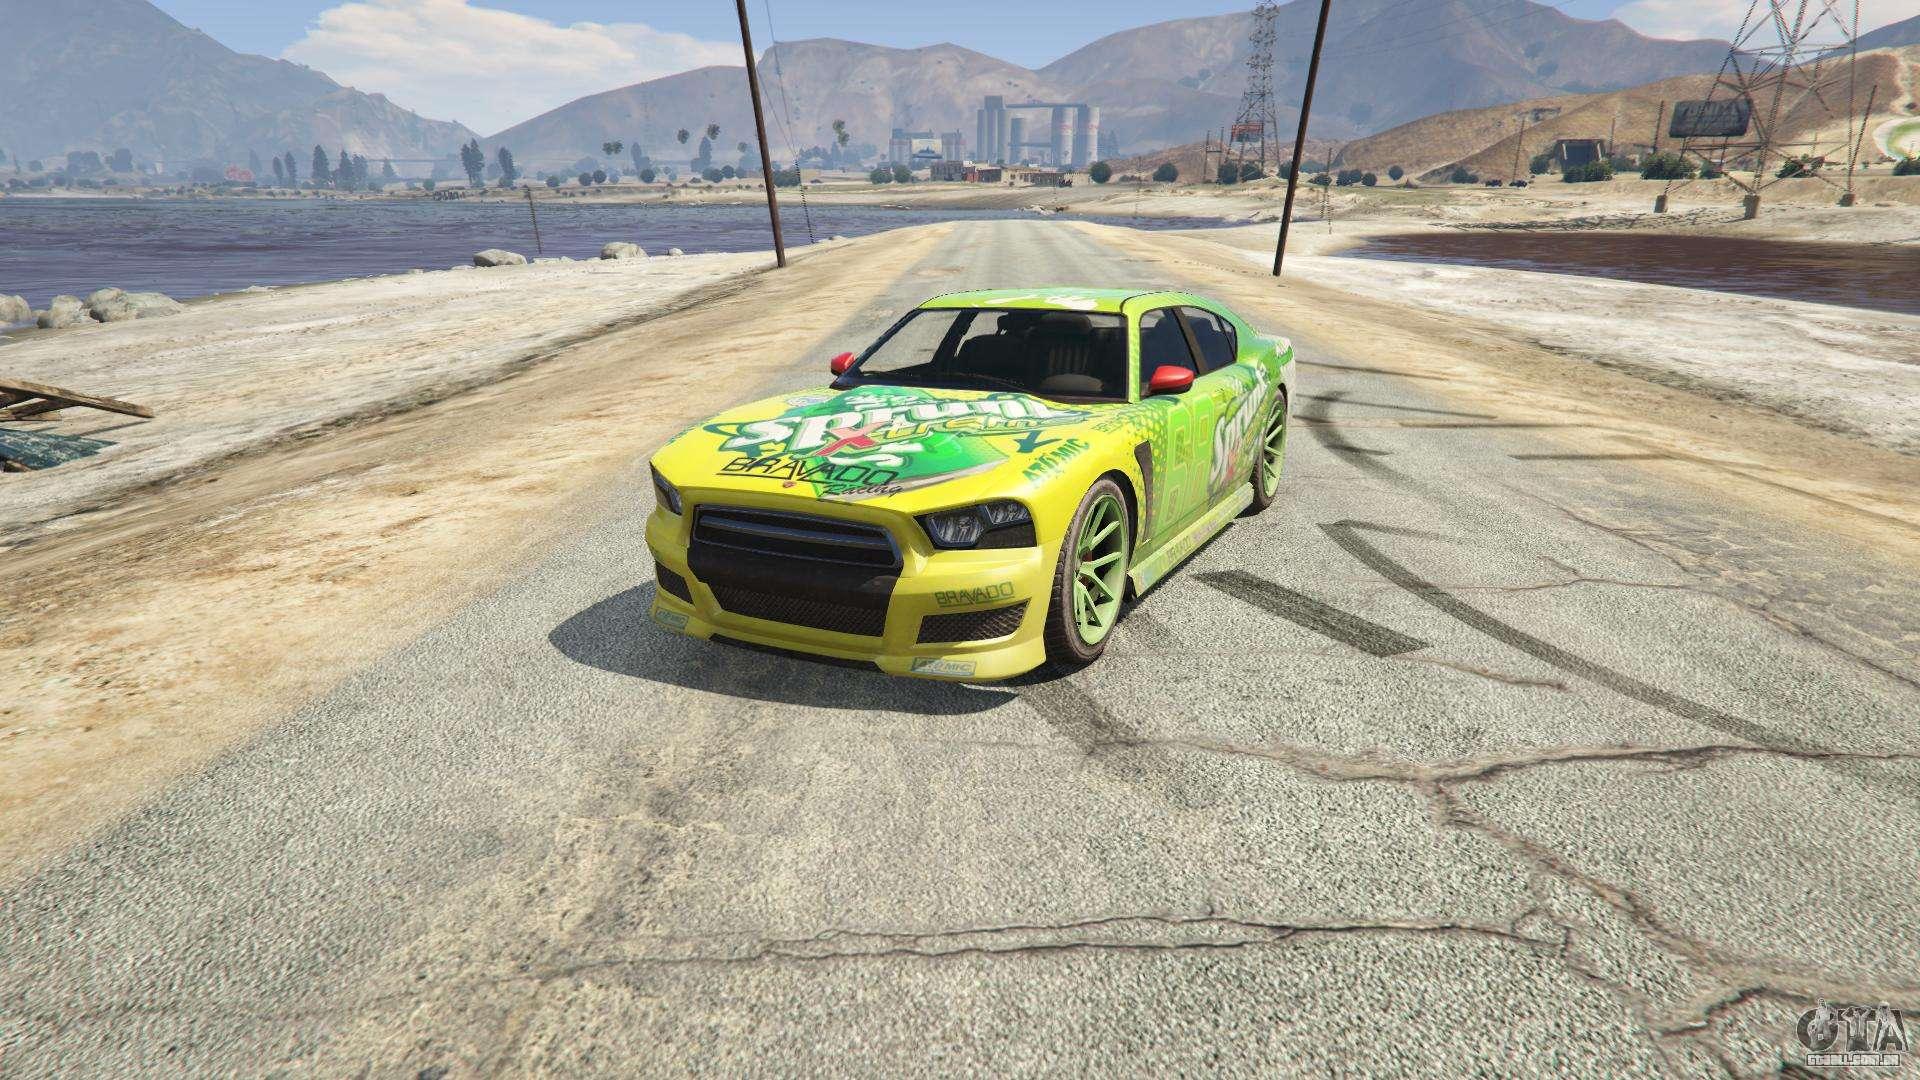 Sprunk Buffalo S GTA 5 - vista frontal